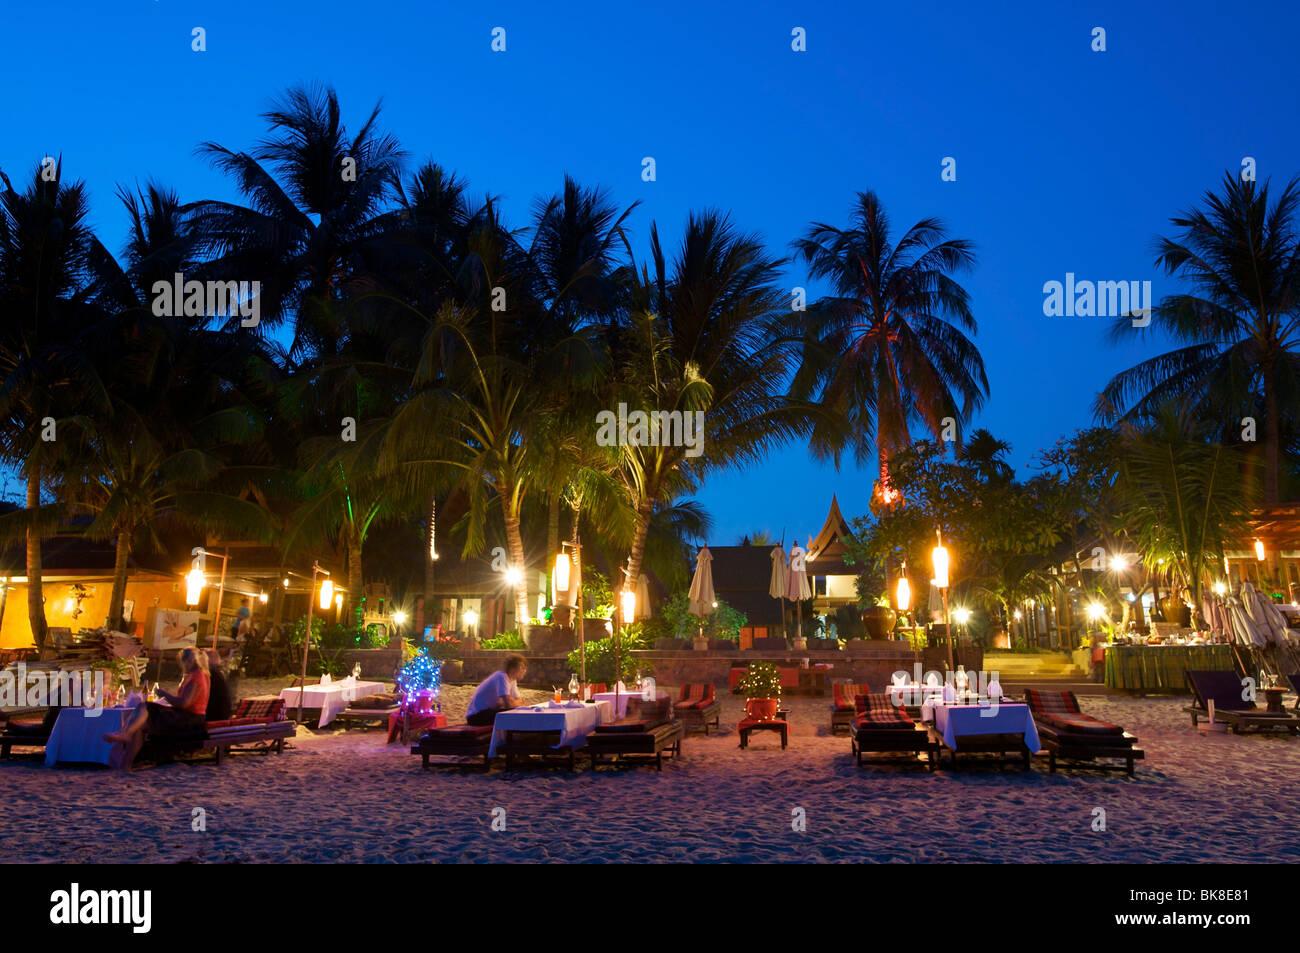 Restraunt Night Dunk Island: Beach Restaurant On Lamai Beach, Ko Samui Island, Thailand